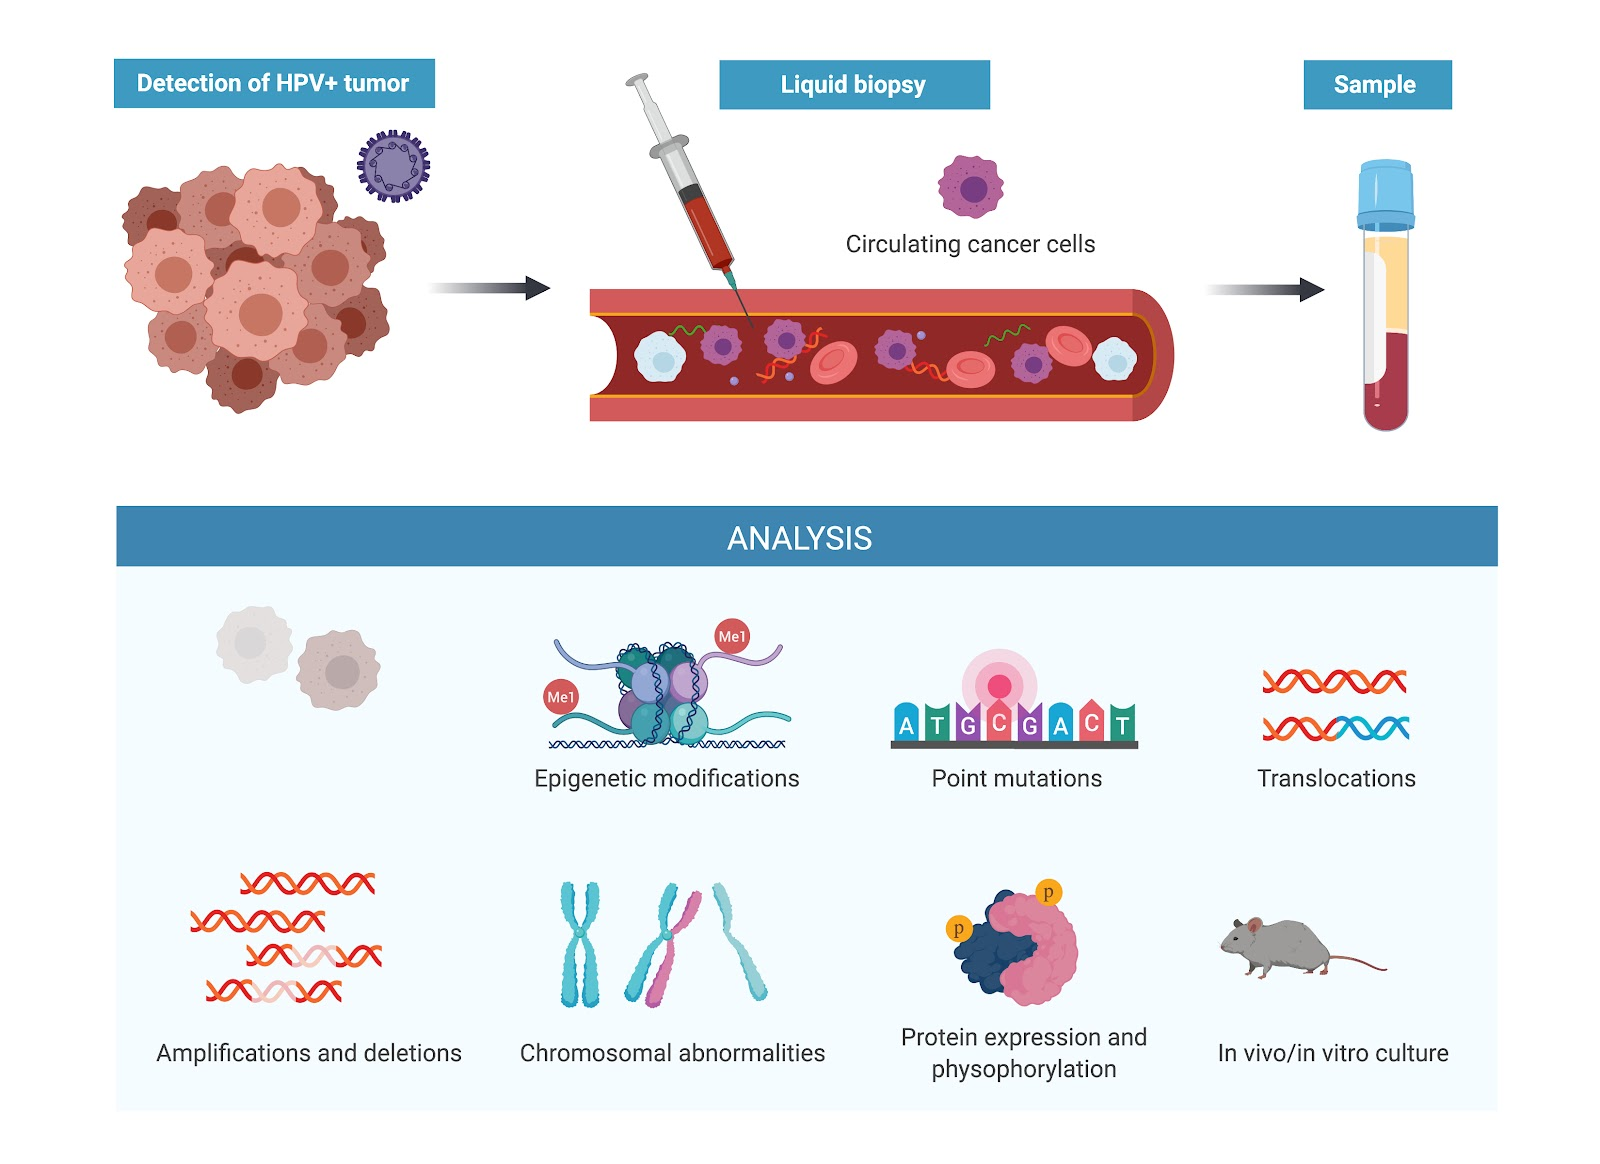 Hpv virus rna or dna Human papillomavirus or HPV virus del papiloma humano sintomas y causas